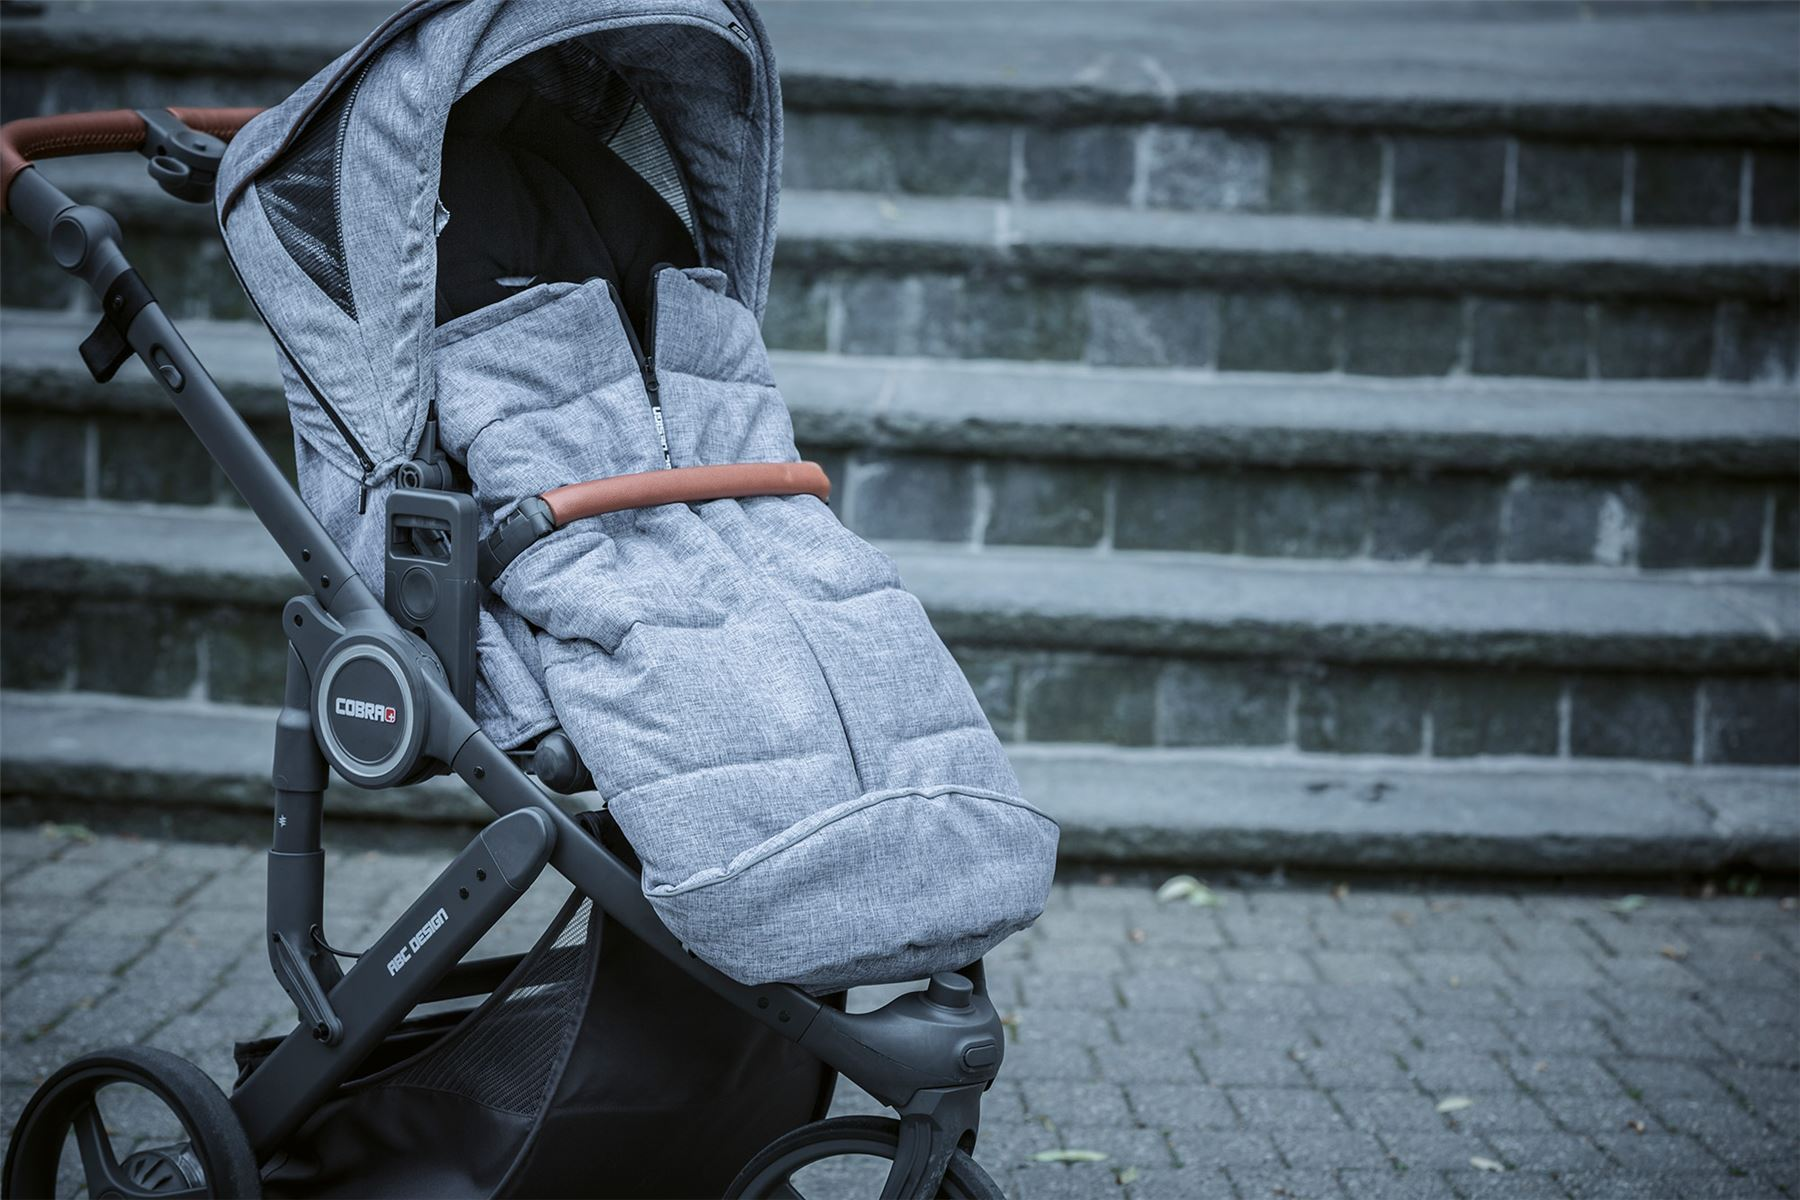 ABC-Design-UNIVERSAL-FLEECE-FOOTMUFF-Baby-Toddler-Travel-Accessory-BN thumbnail 8